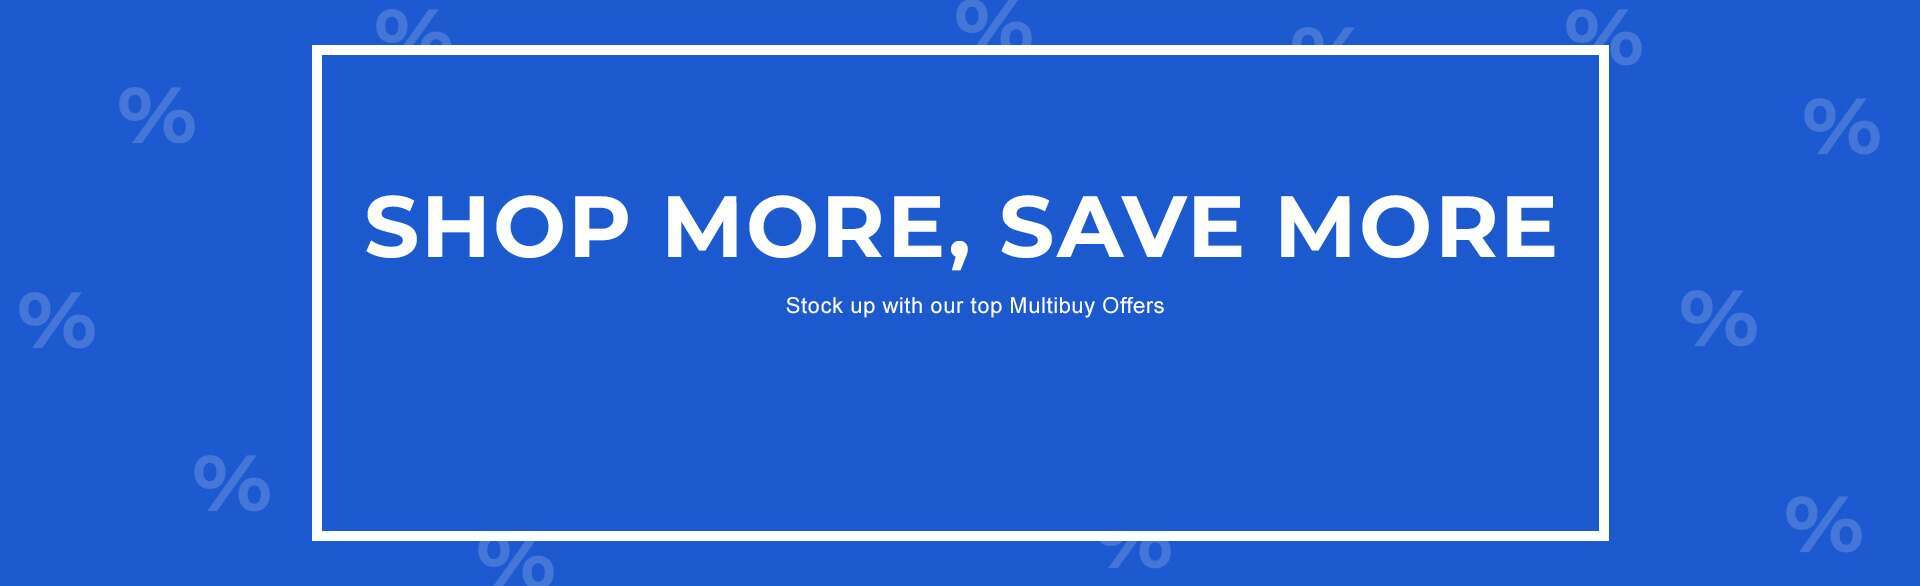 Shop More, Save More